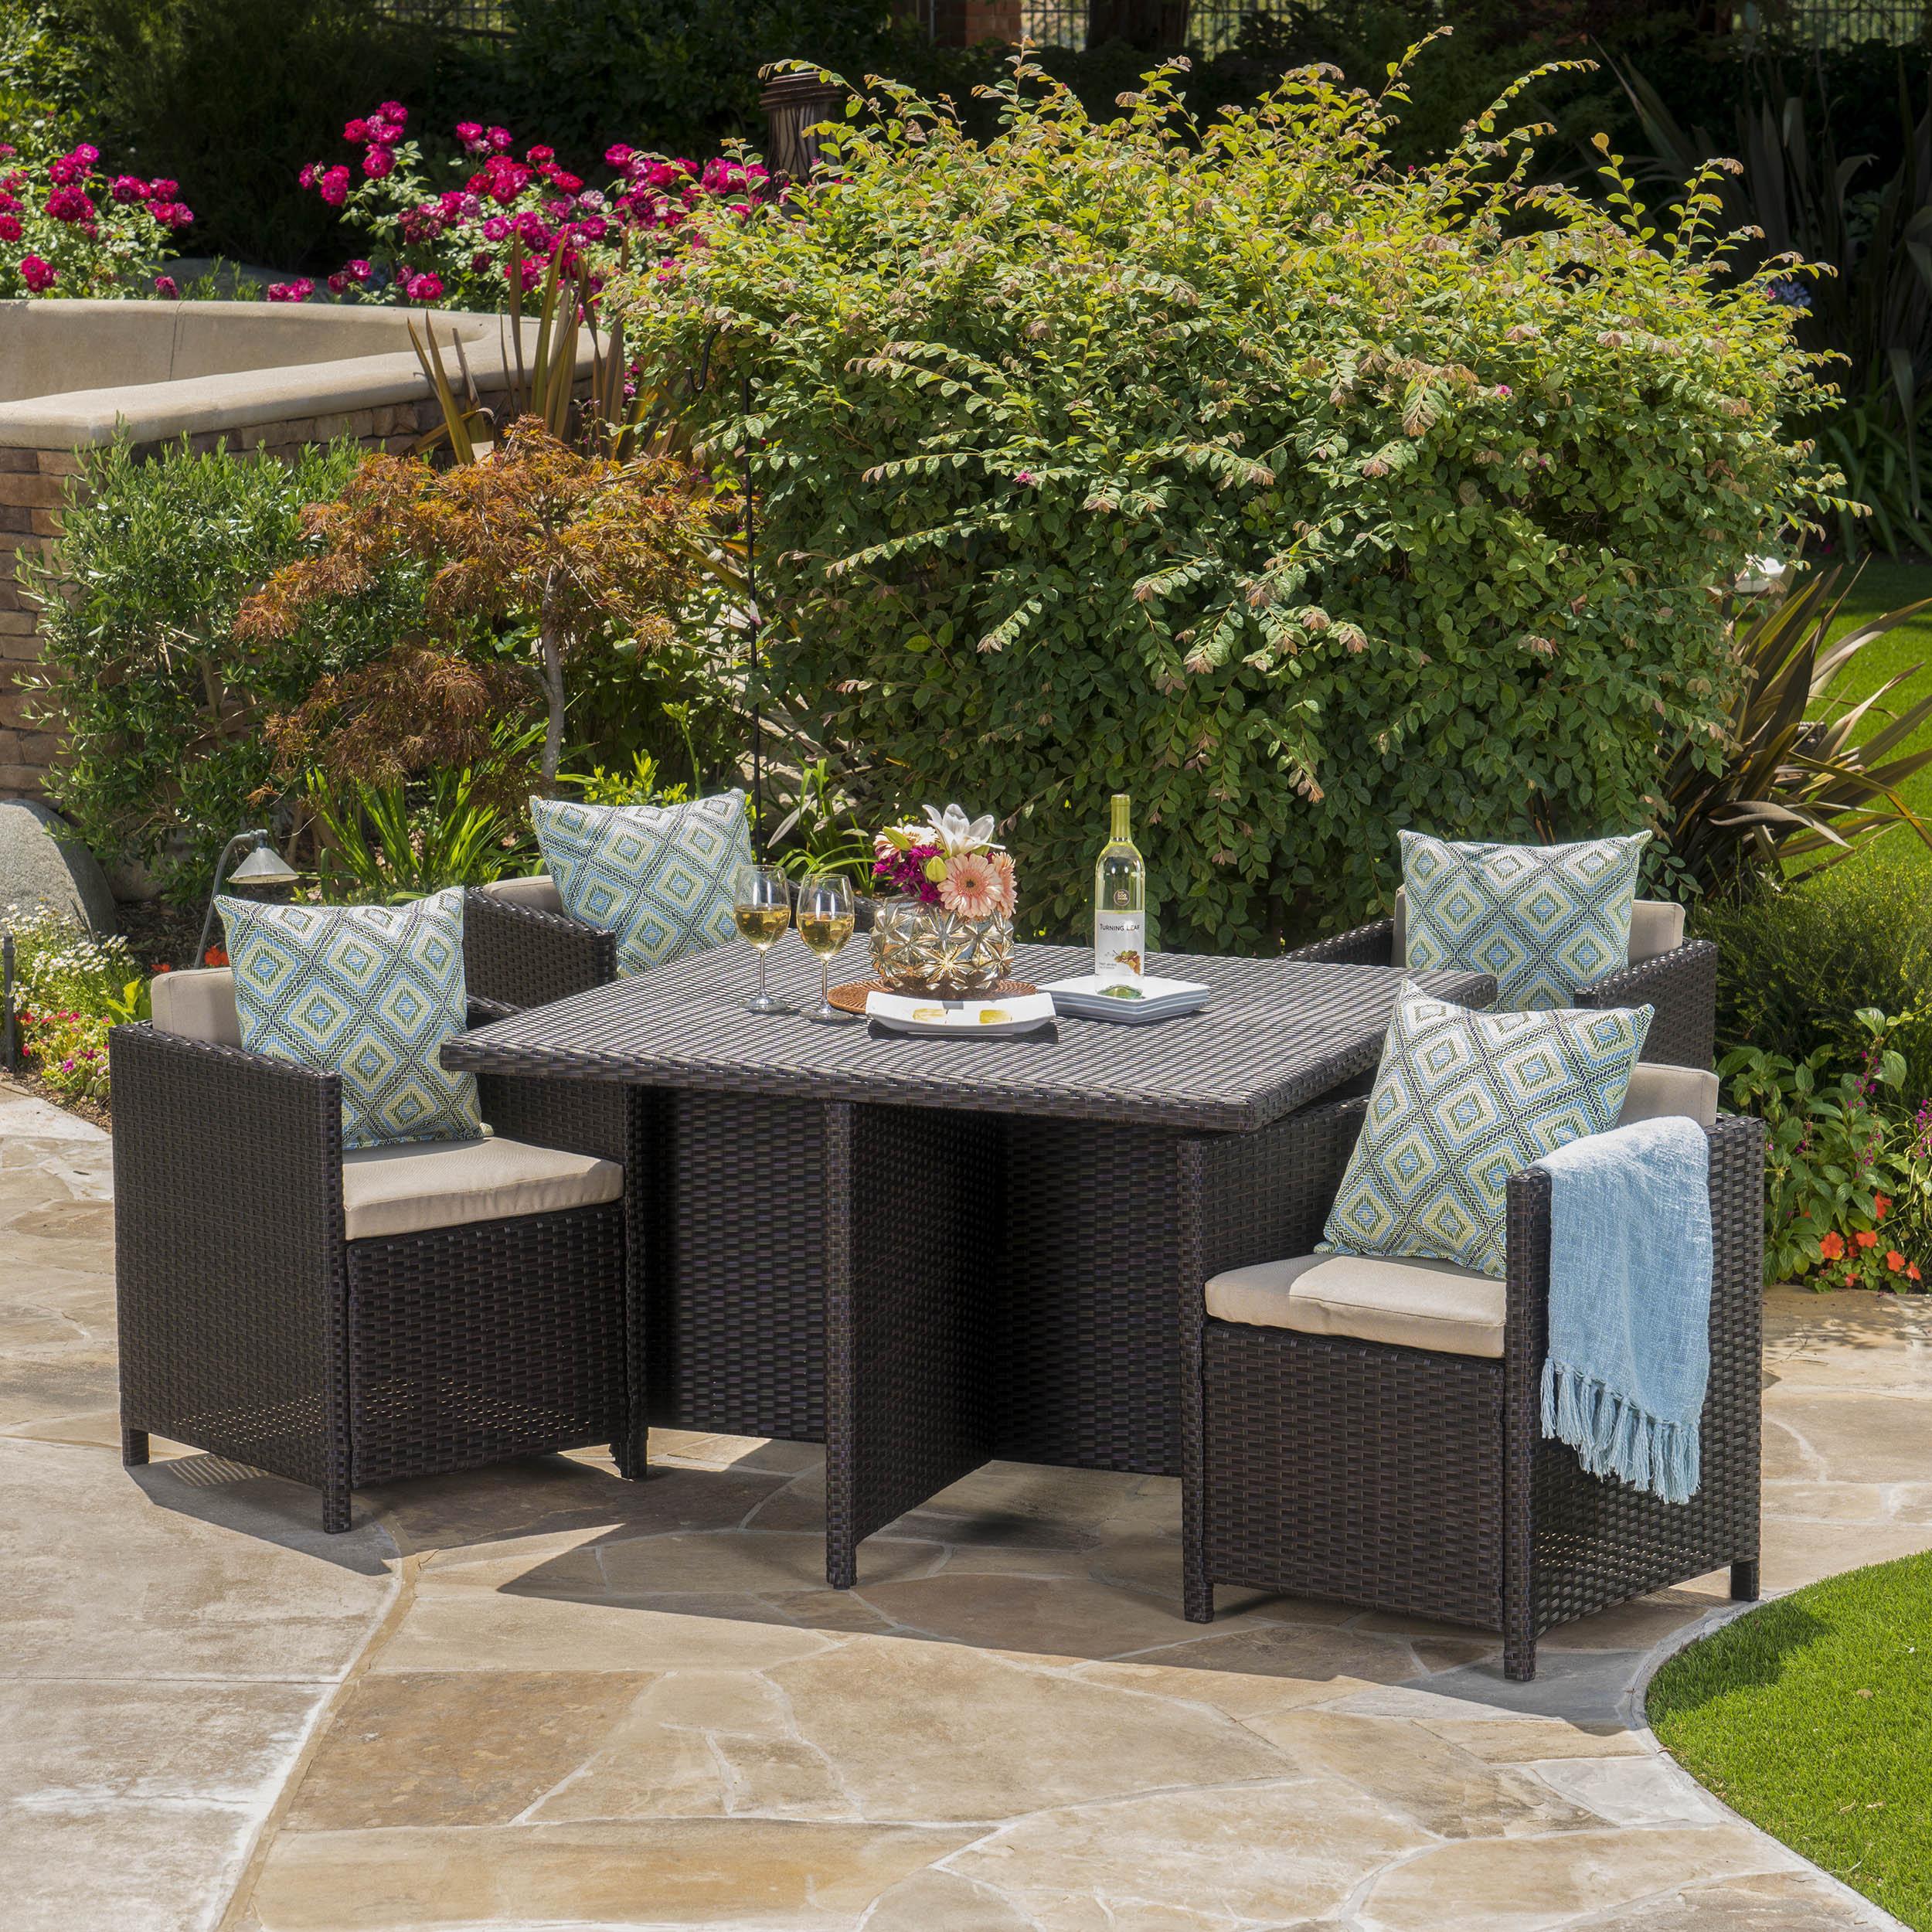 Willa Arlo Interiors Bashir Outdoor Wicker Dining Set With Cushions U0026  Reviews   Wayfair